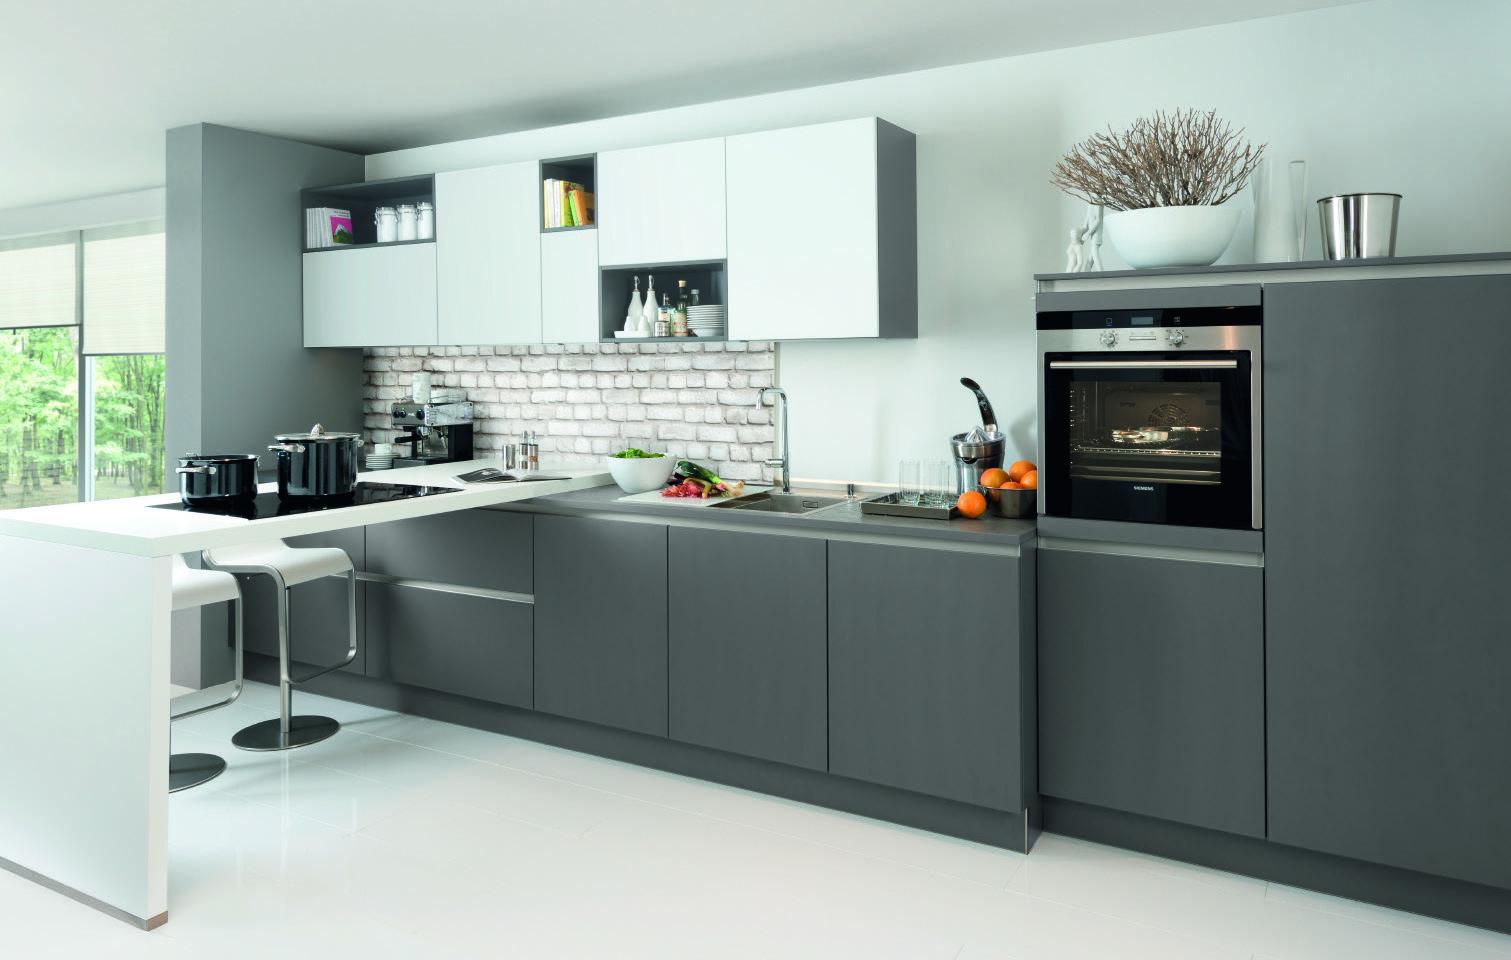 glas tec plus kuchendesign le cucine di qualit a roma. Black Bedroom Furniture Sets. Home Design Ideas